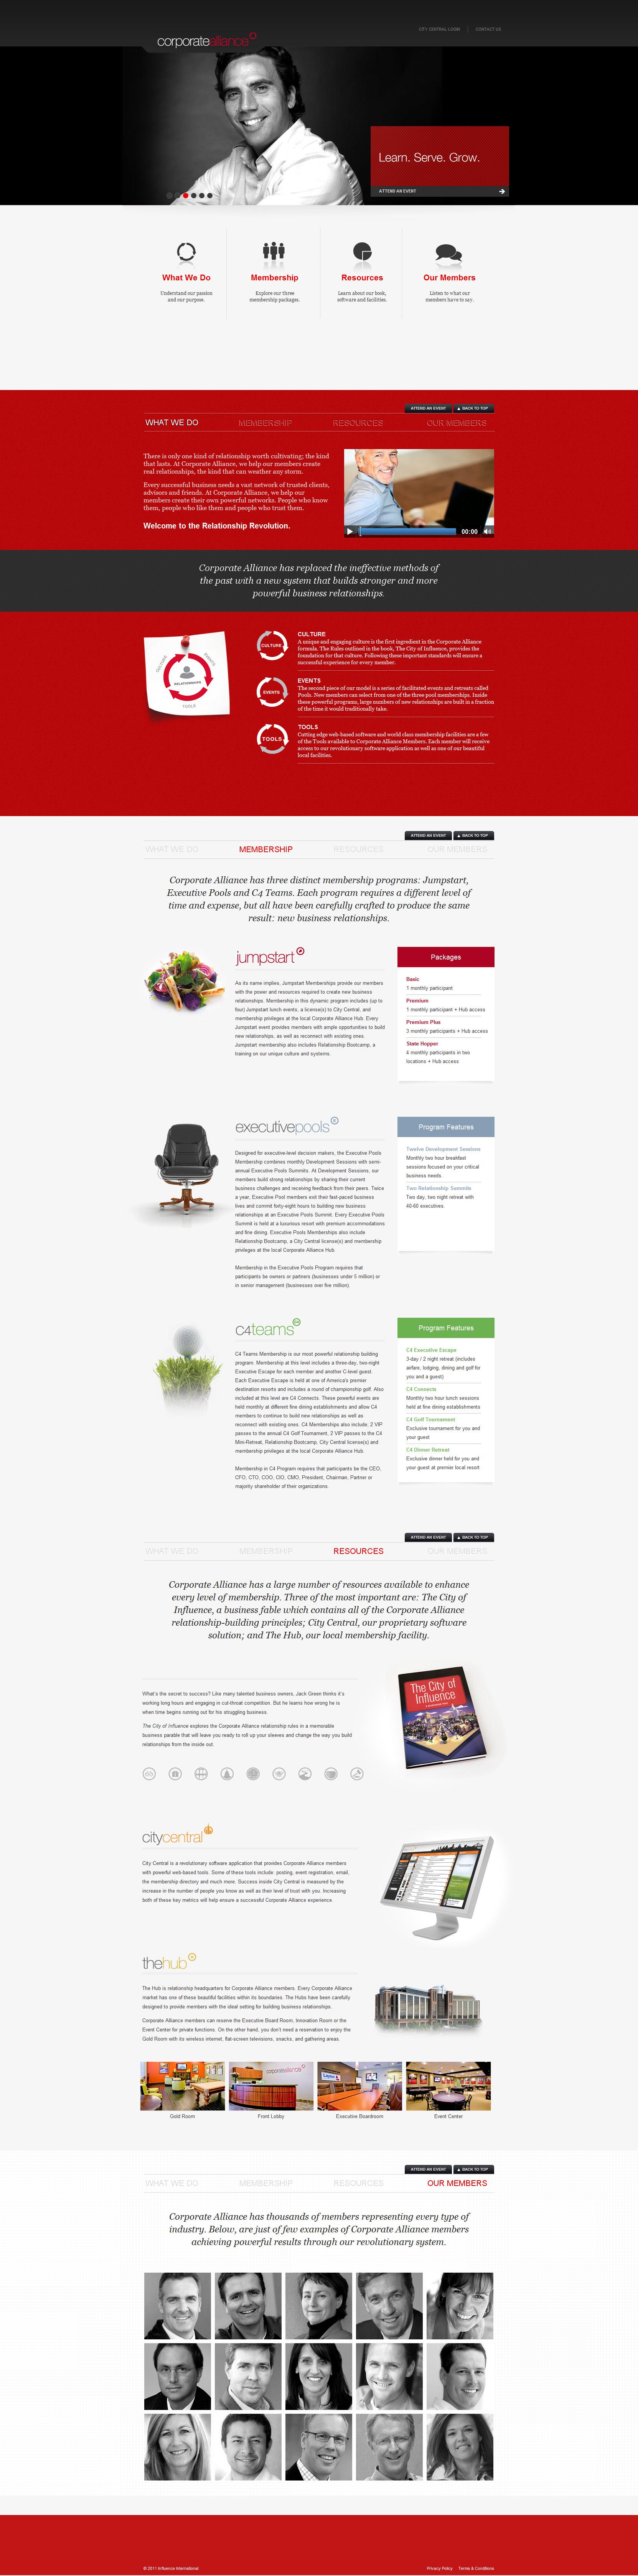 Corporate Alliance Website Screenshot